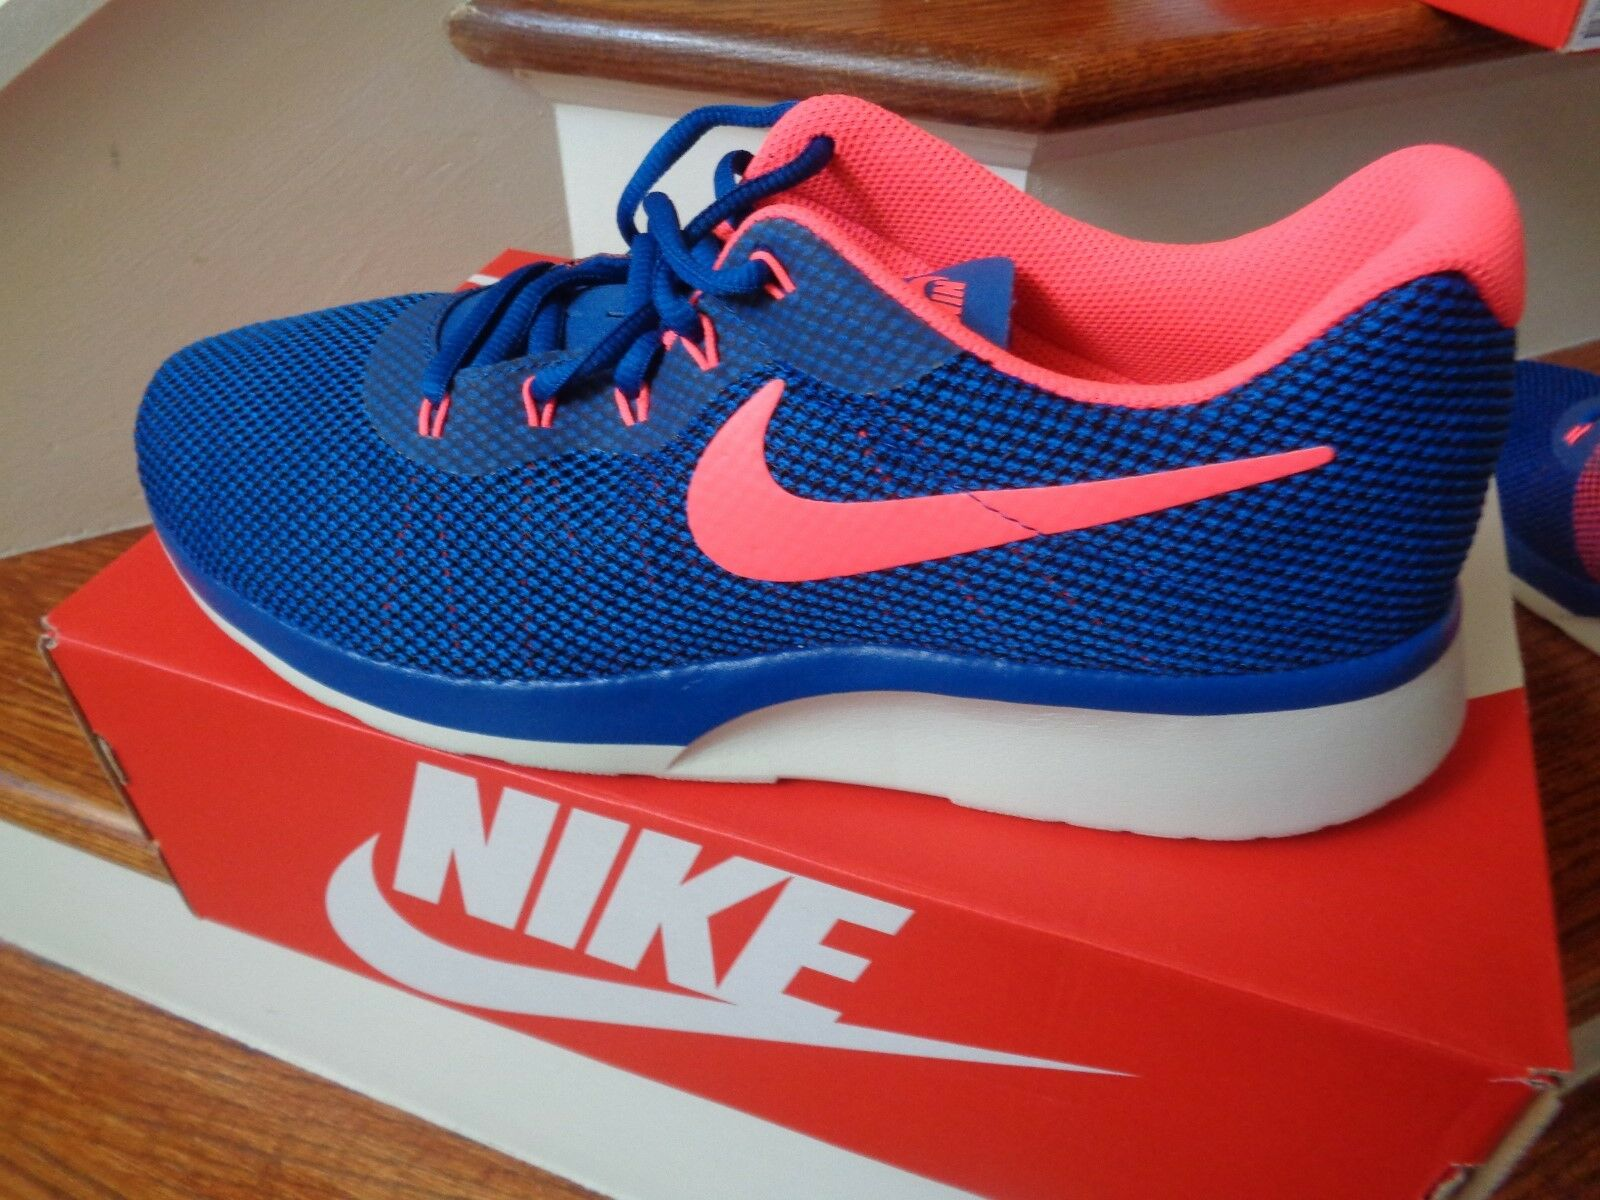 the latest 09ca8 7e677 Nike tanjun racer uomini scarpe da corsa, 921669 402 402 402 taglia 9 nwb  12bda0